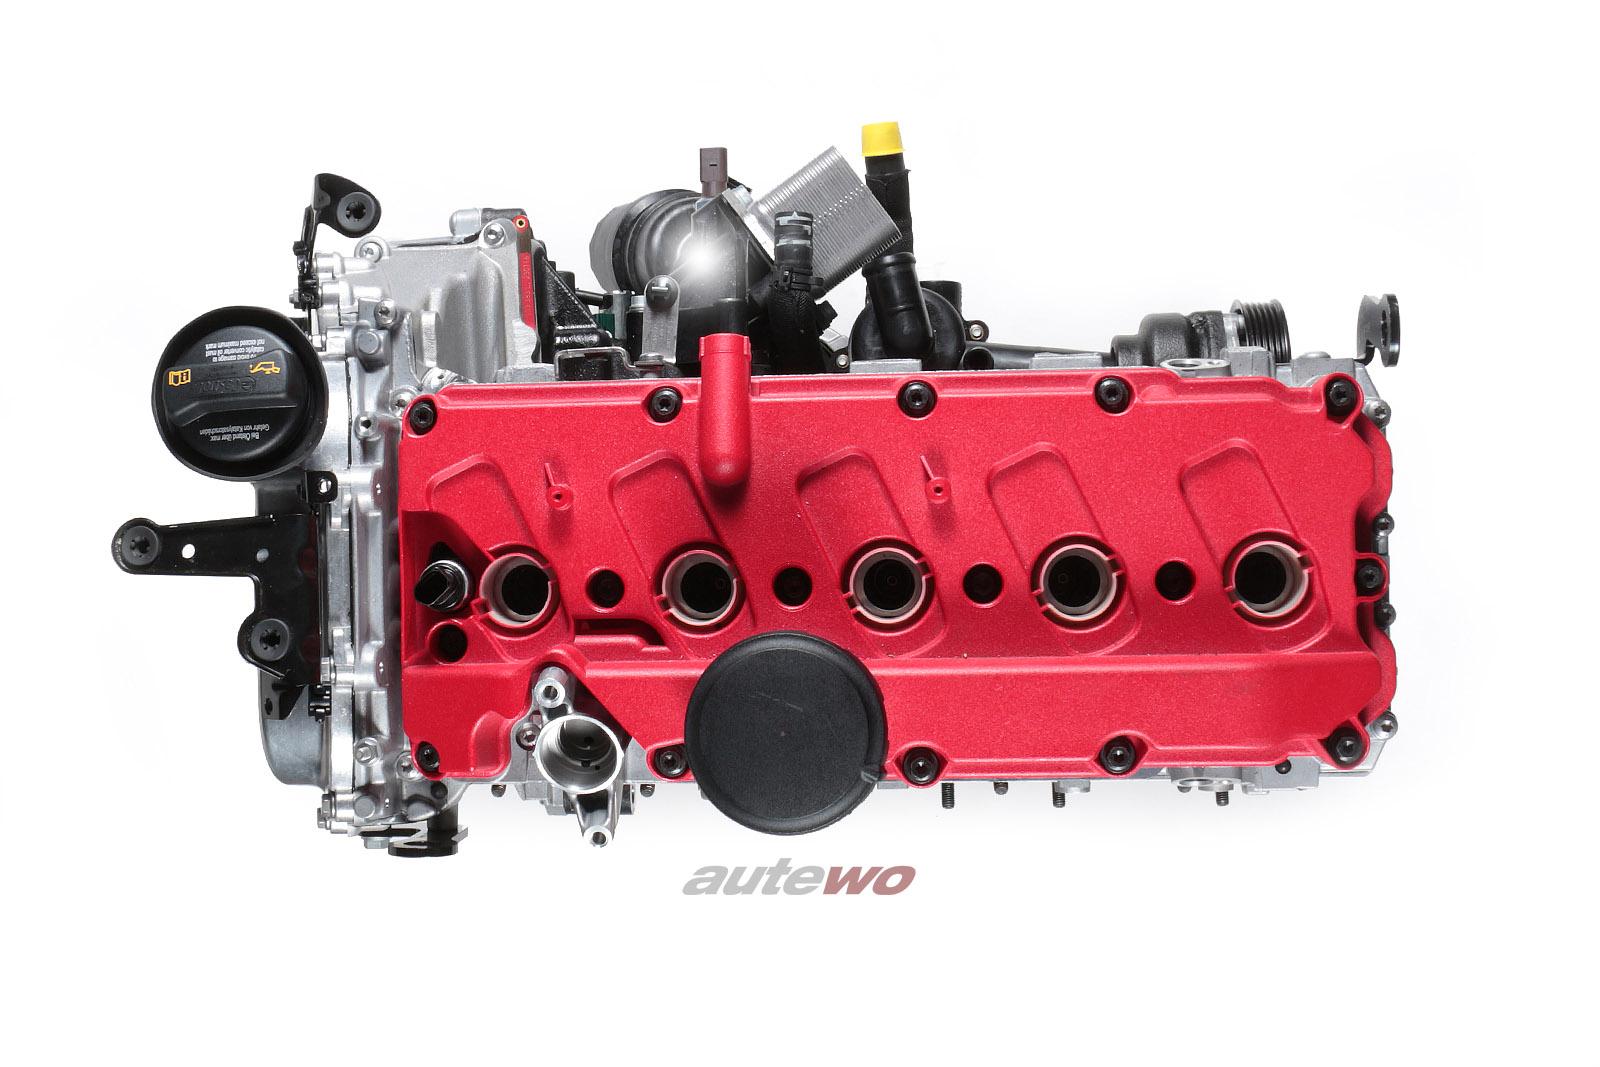 #07K100032H NEU Audi RS3 8V 2.5l TFSI 340PS 5 Zylinder CZGB Motor im Austausch